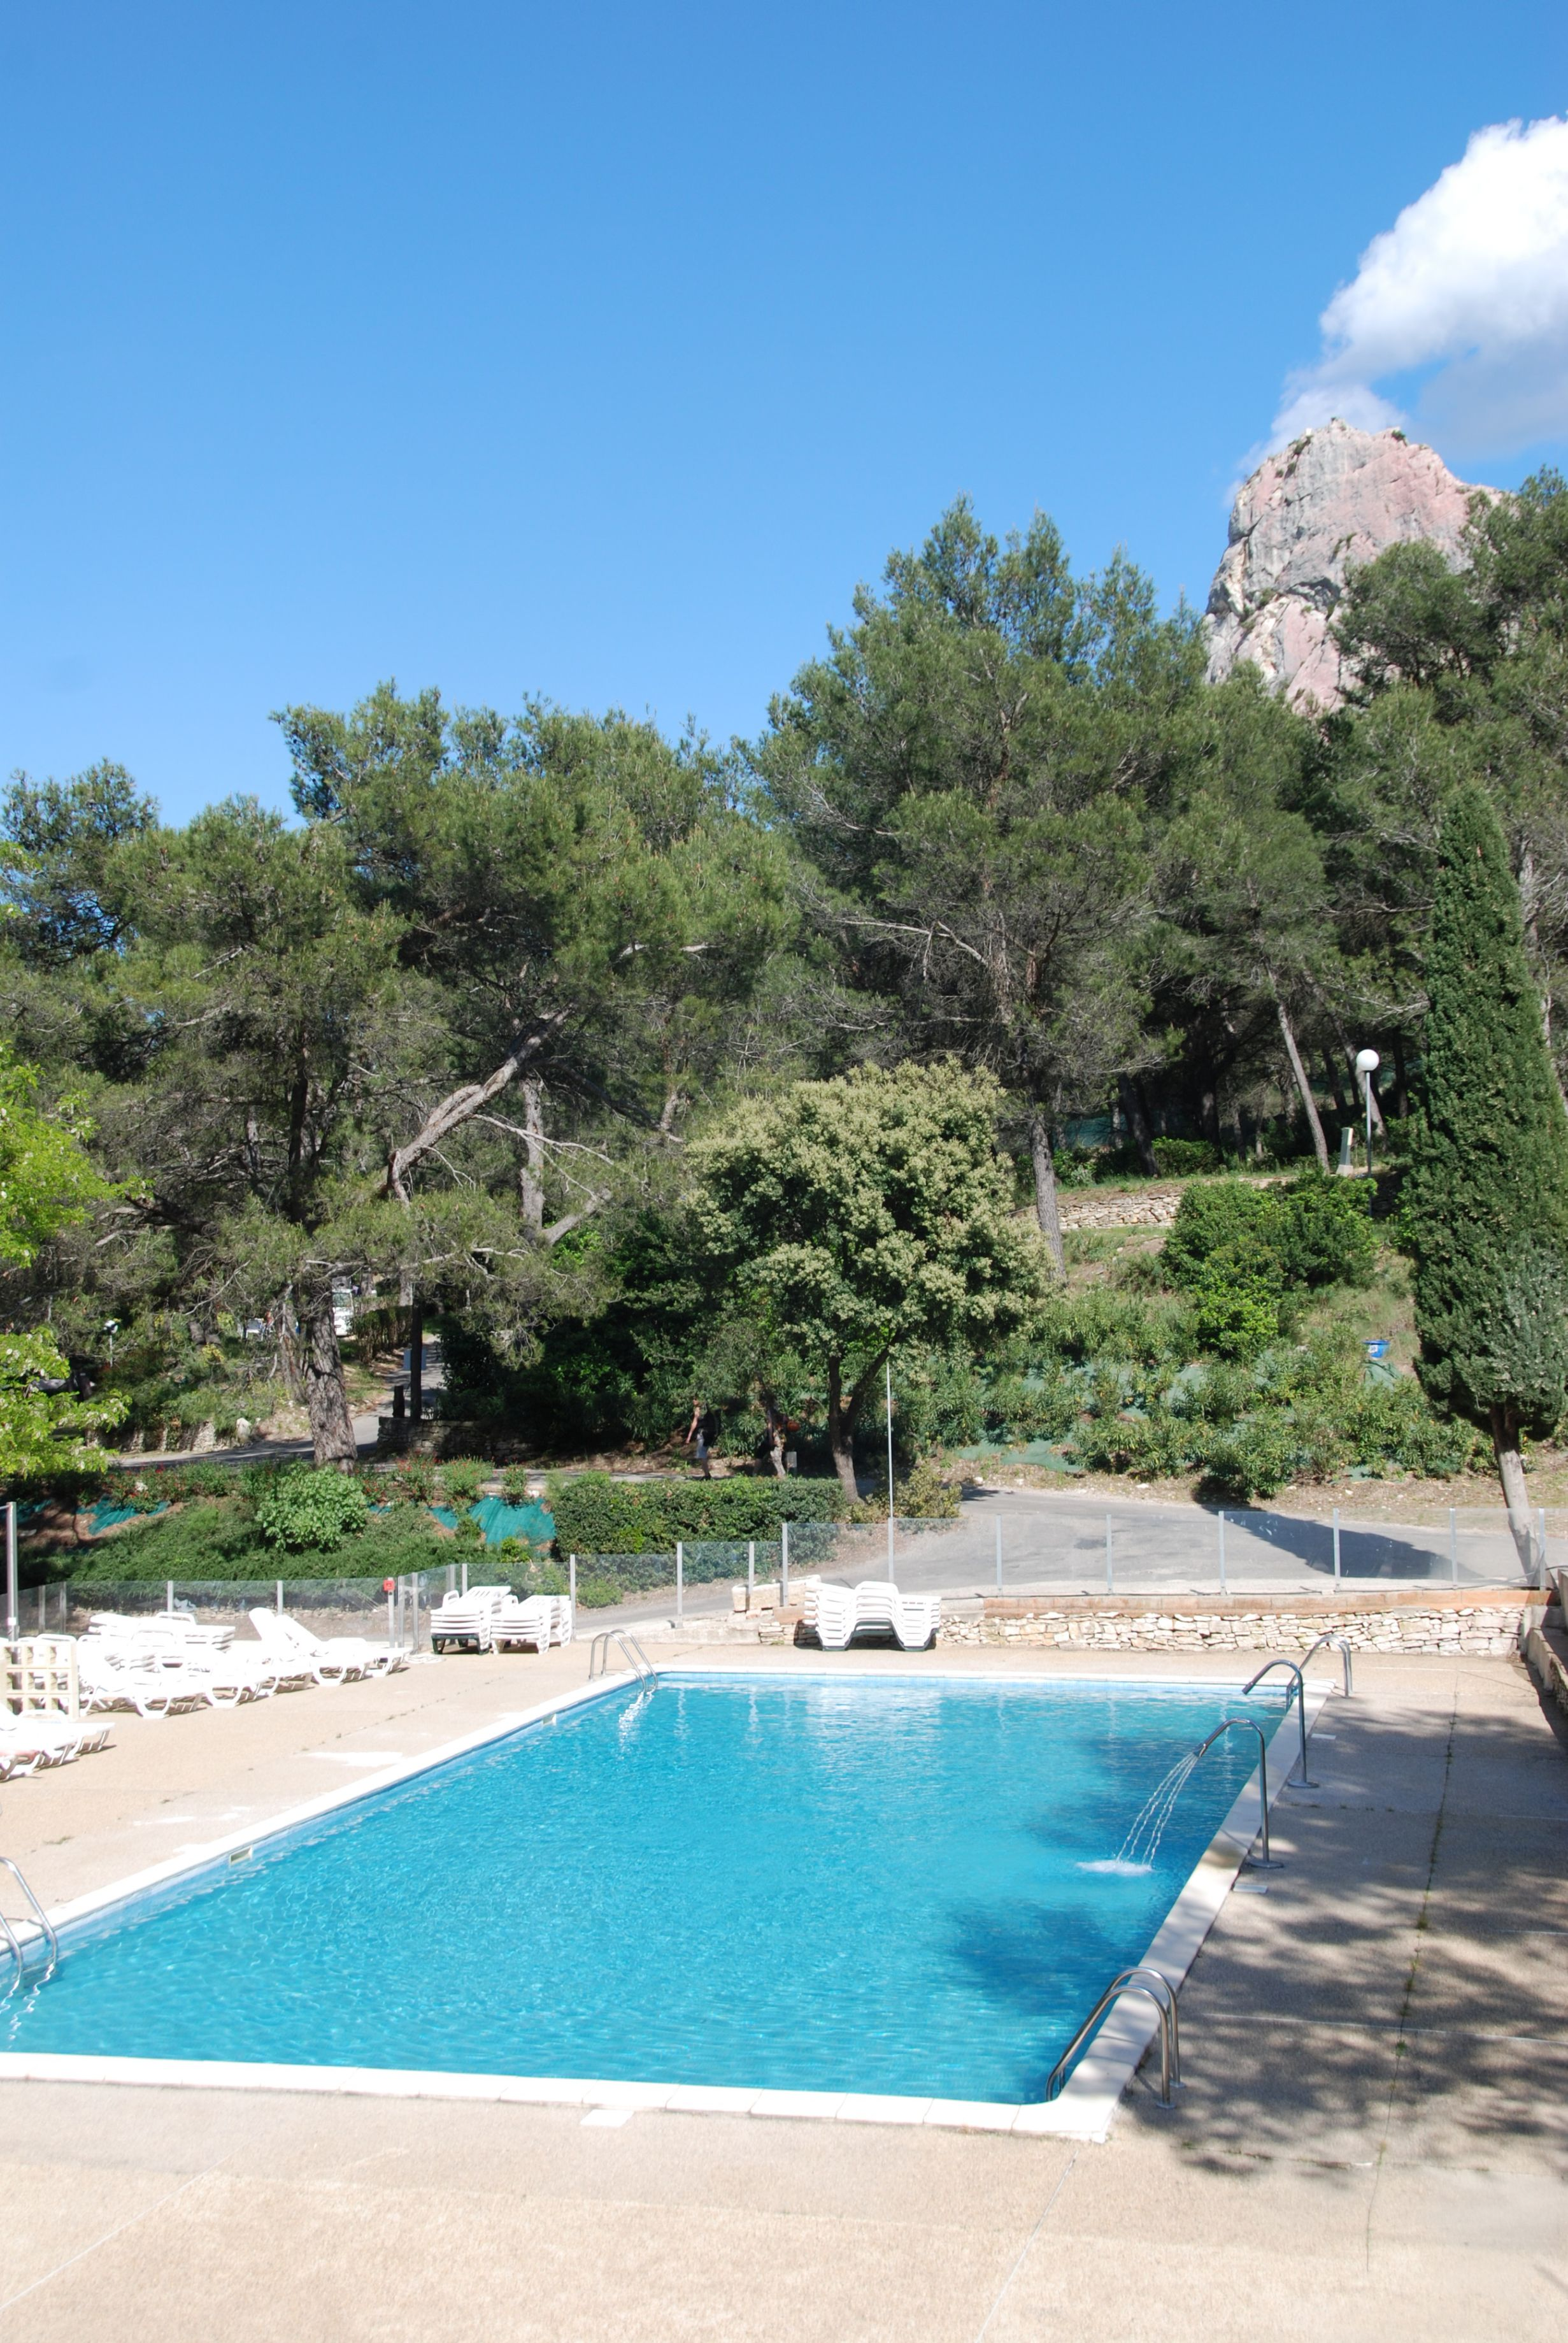 Camping en Provence avec piscine